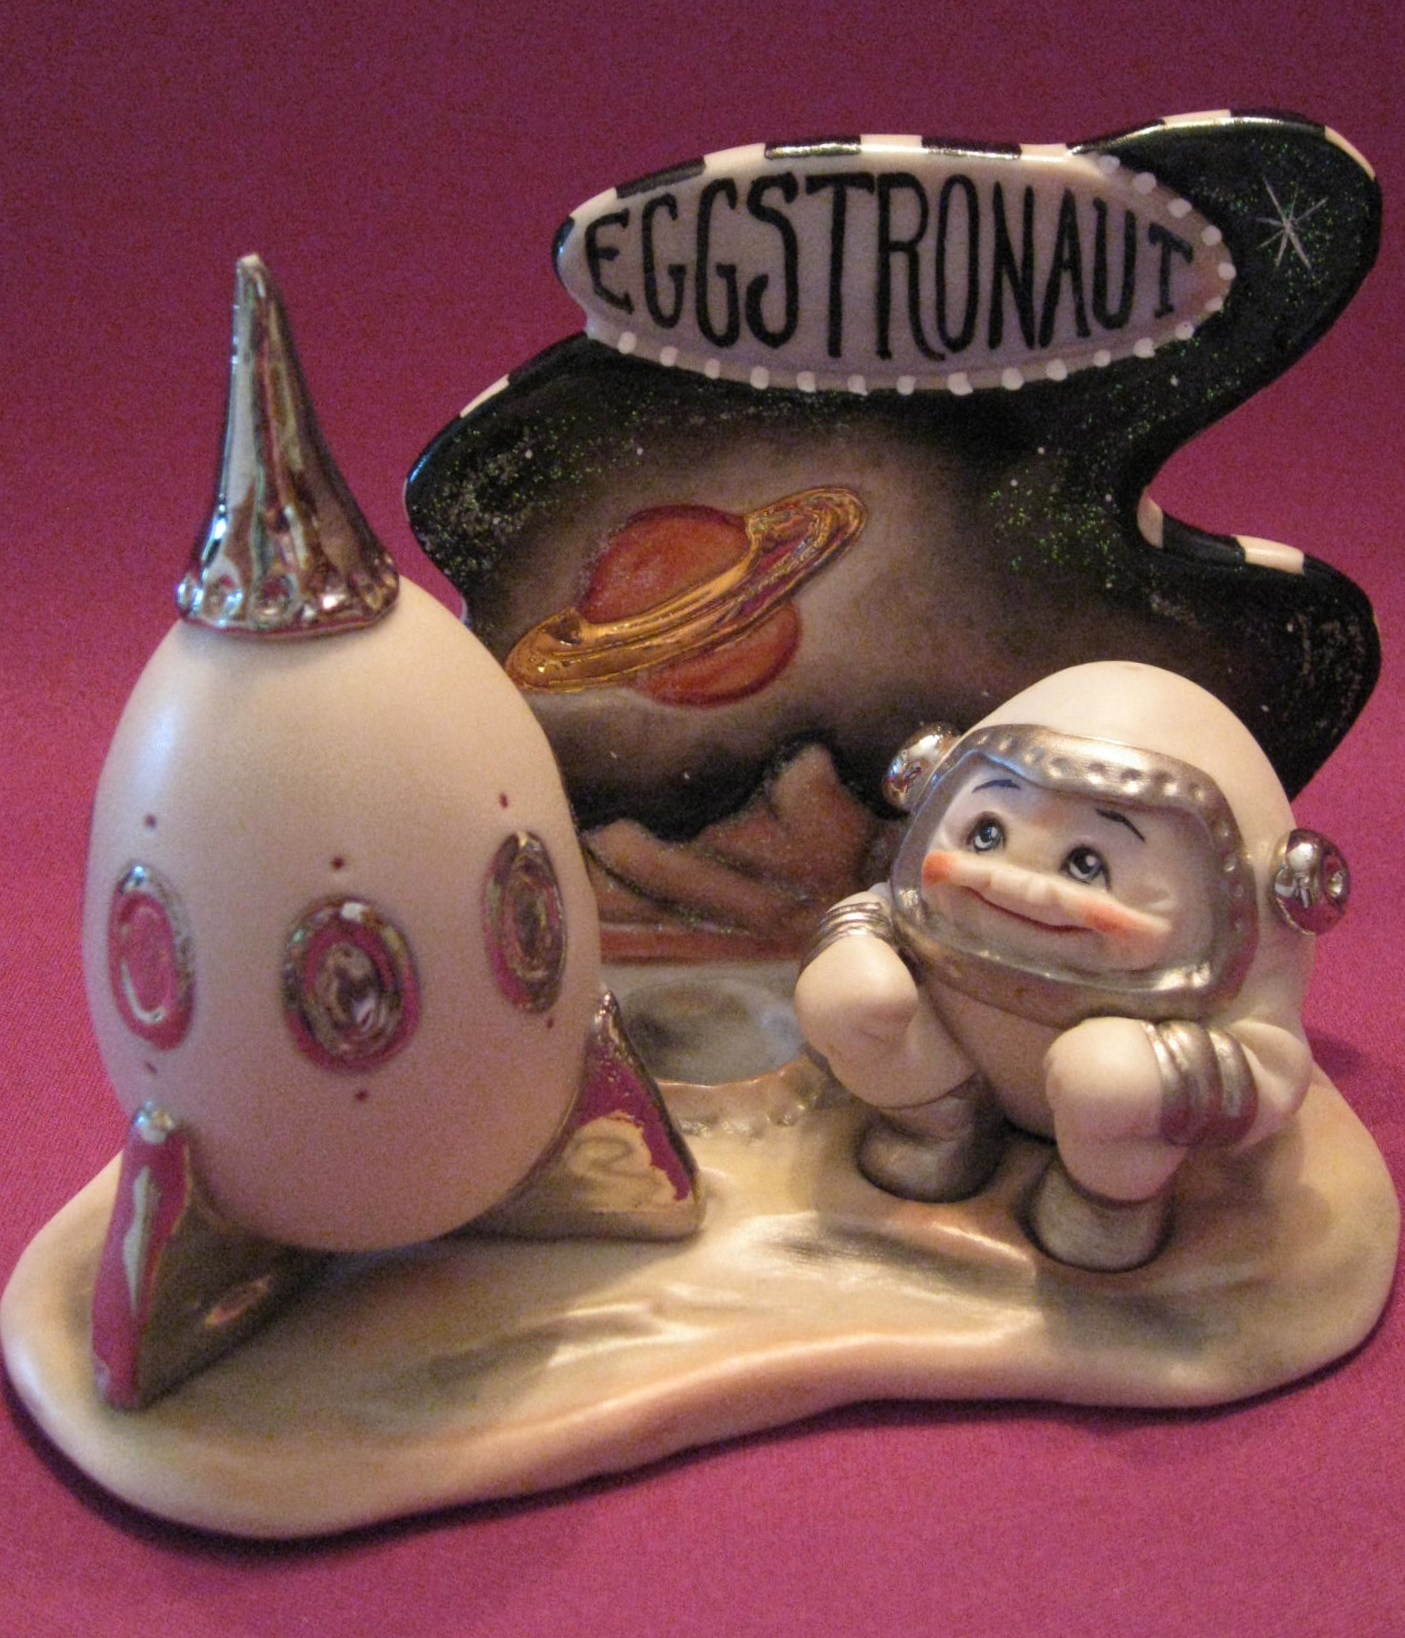 eggstronaut